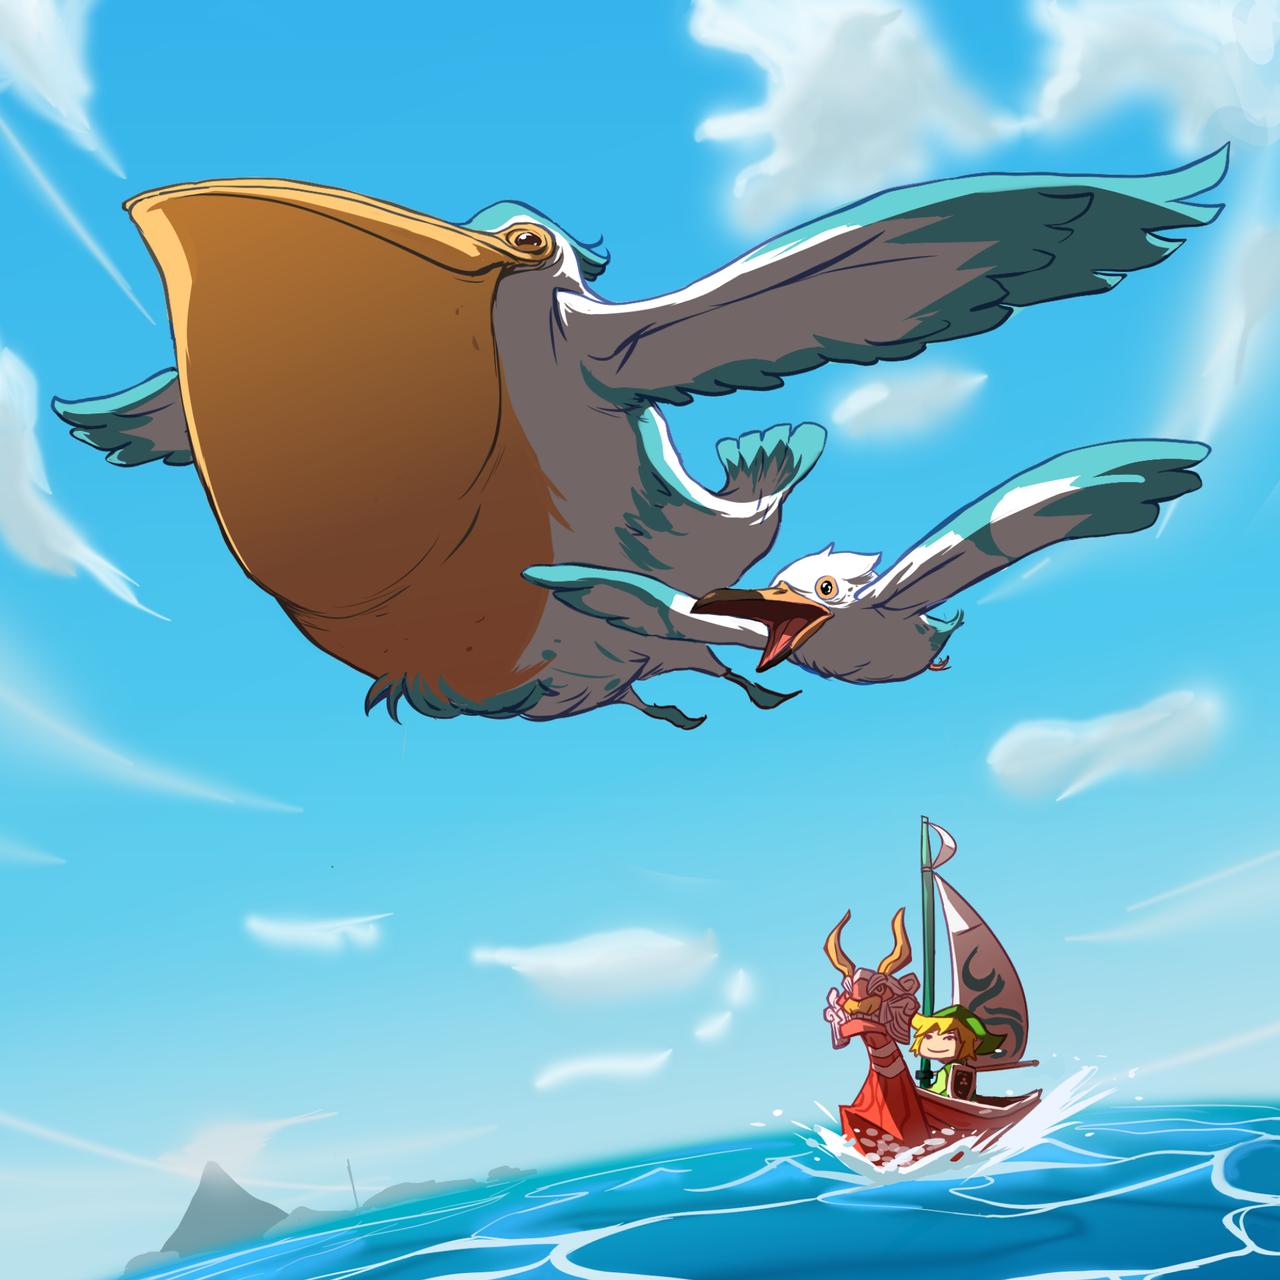 Wingull - Pelipper   Great Sea by MrRedButcher